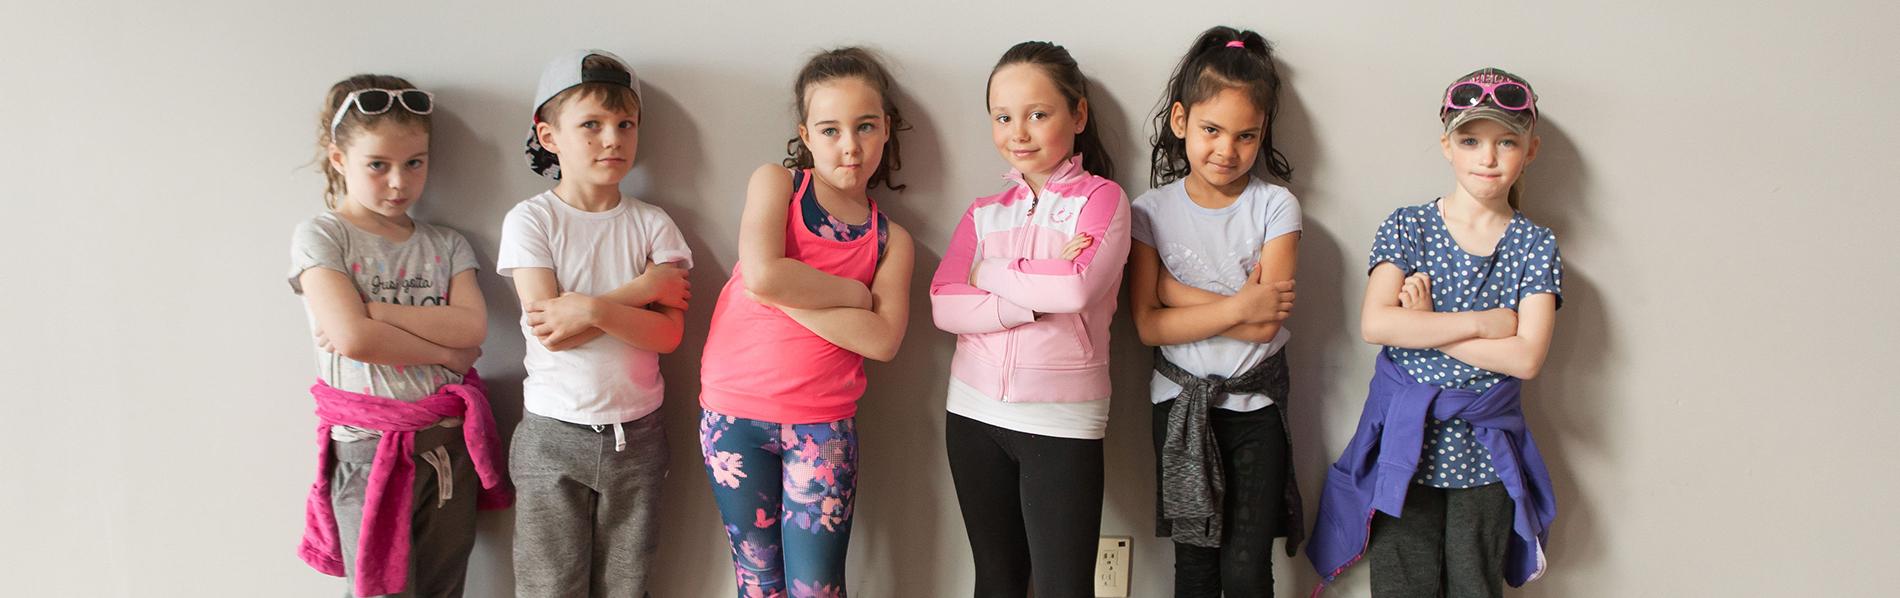 Devotion Danceworks Calgary Hip Hop Class for kids